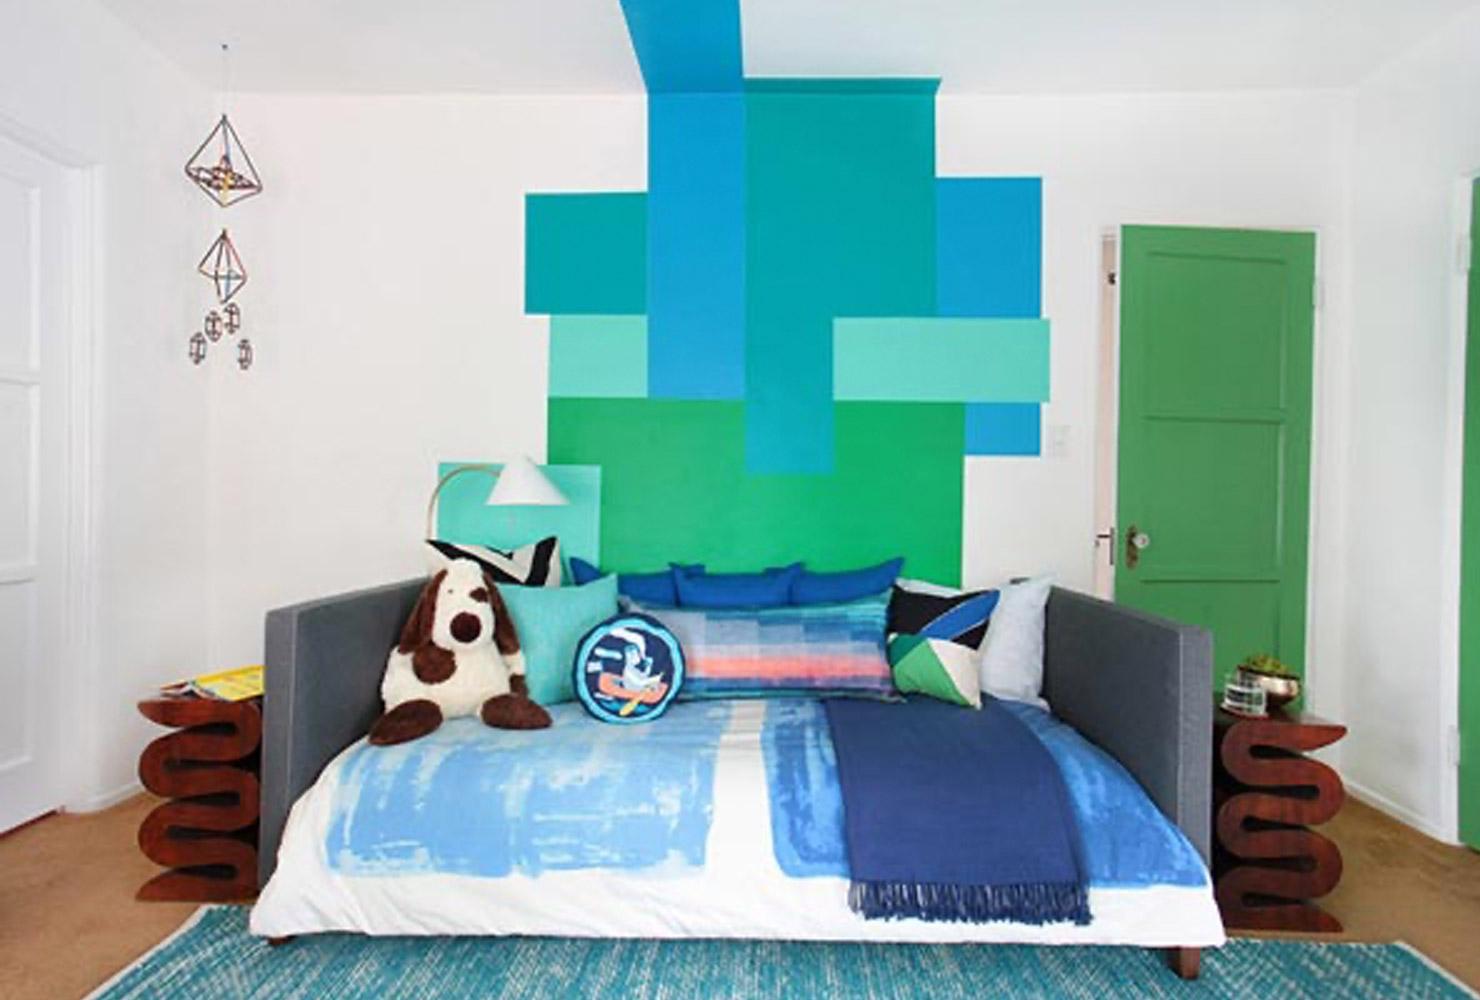 سرویس خواب کودک نوجوان سبز آبی سفید